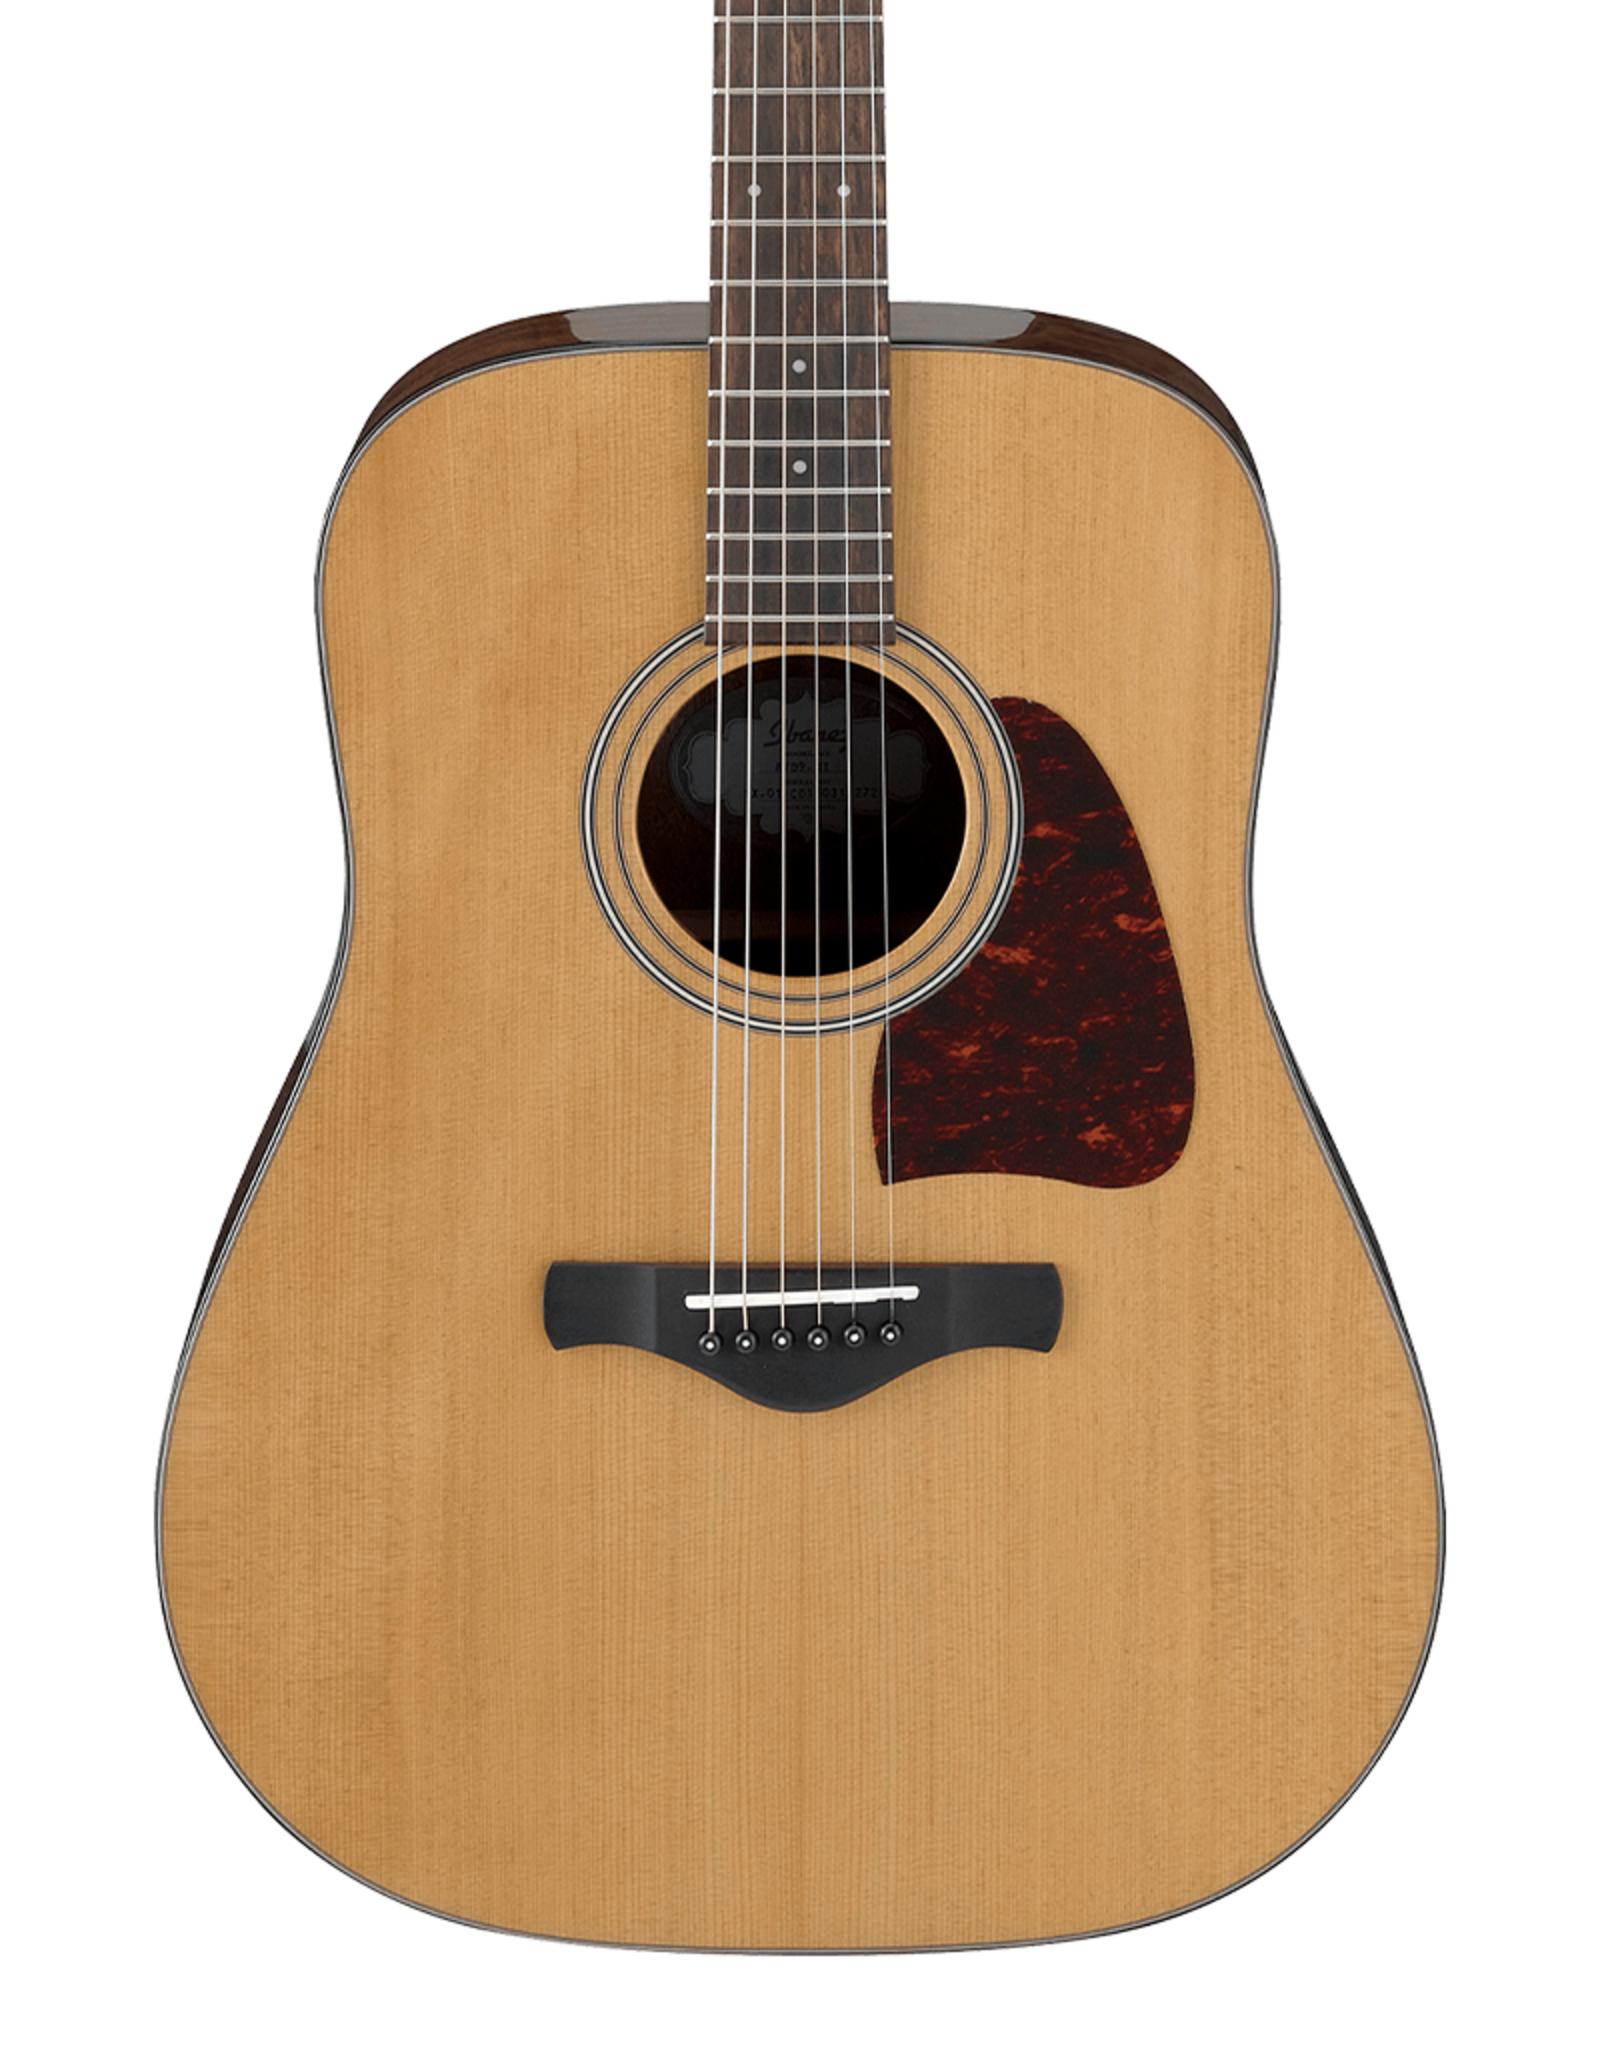 Ibanez Ibanez Acoustic Guitar Thermal Aged Natural